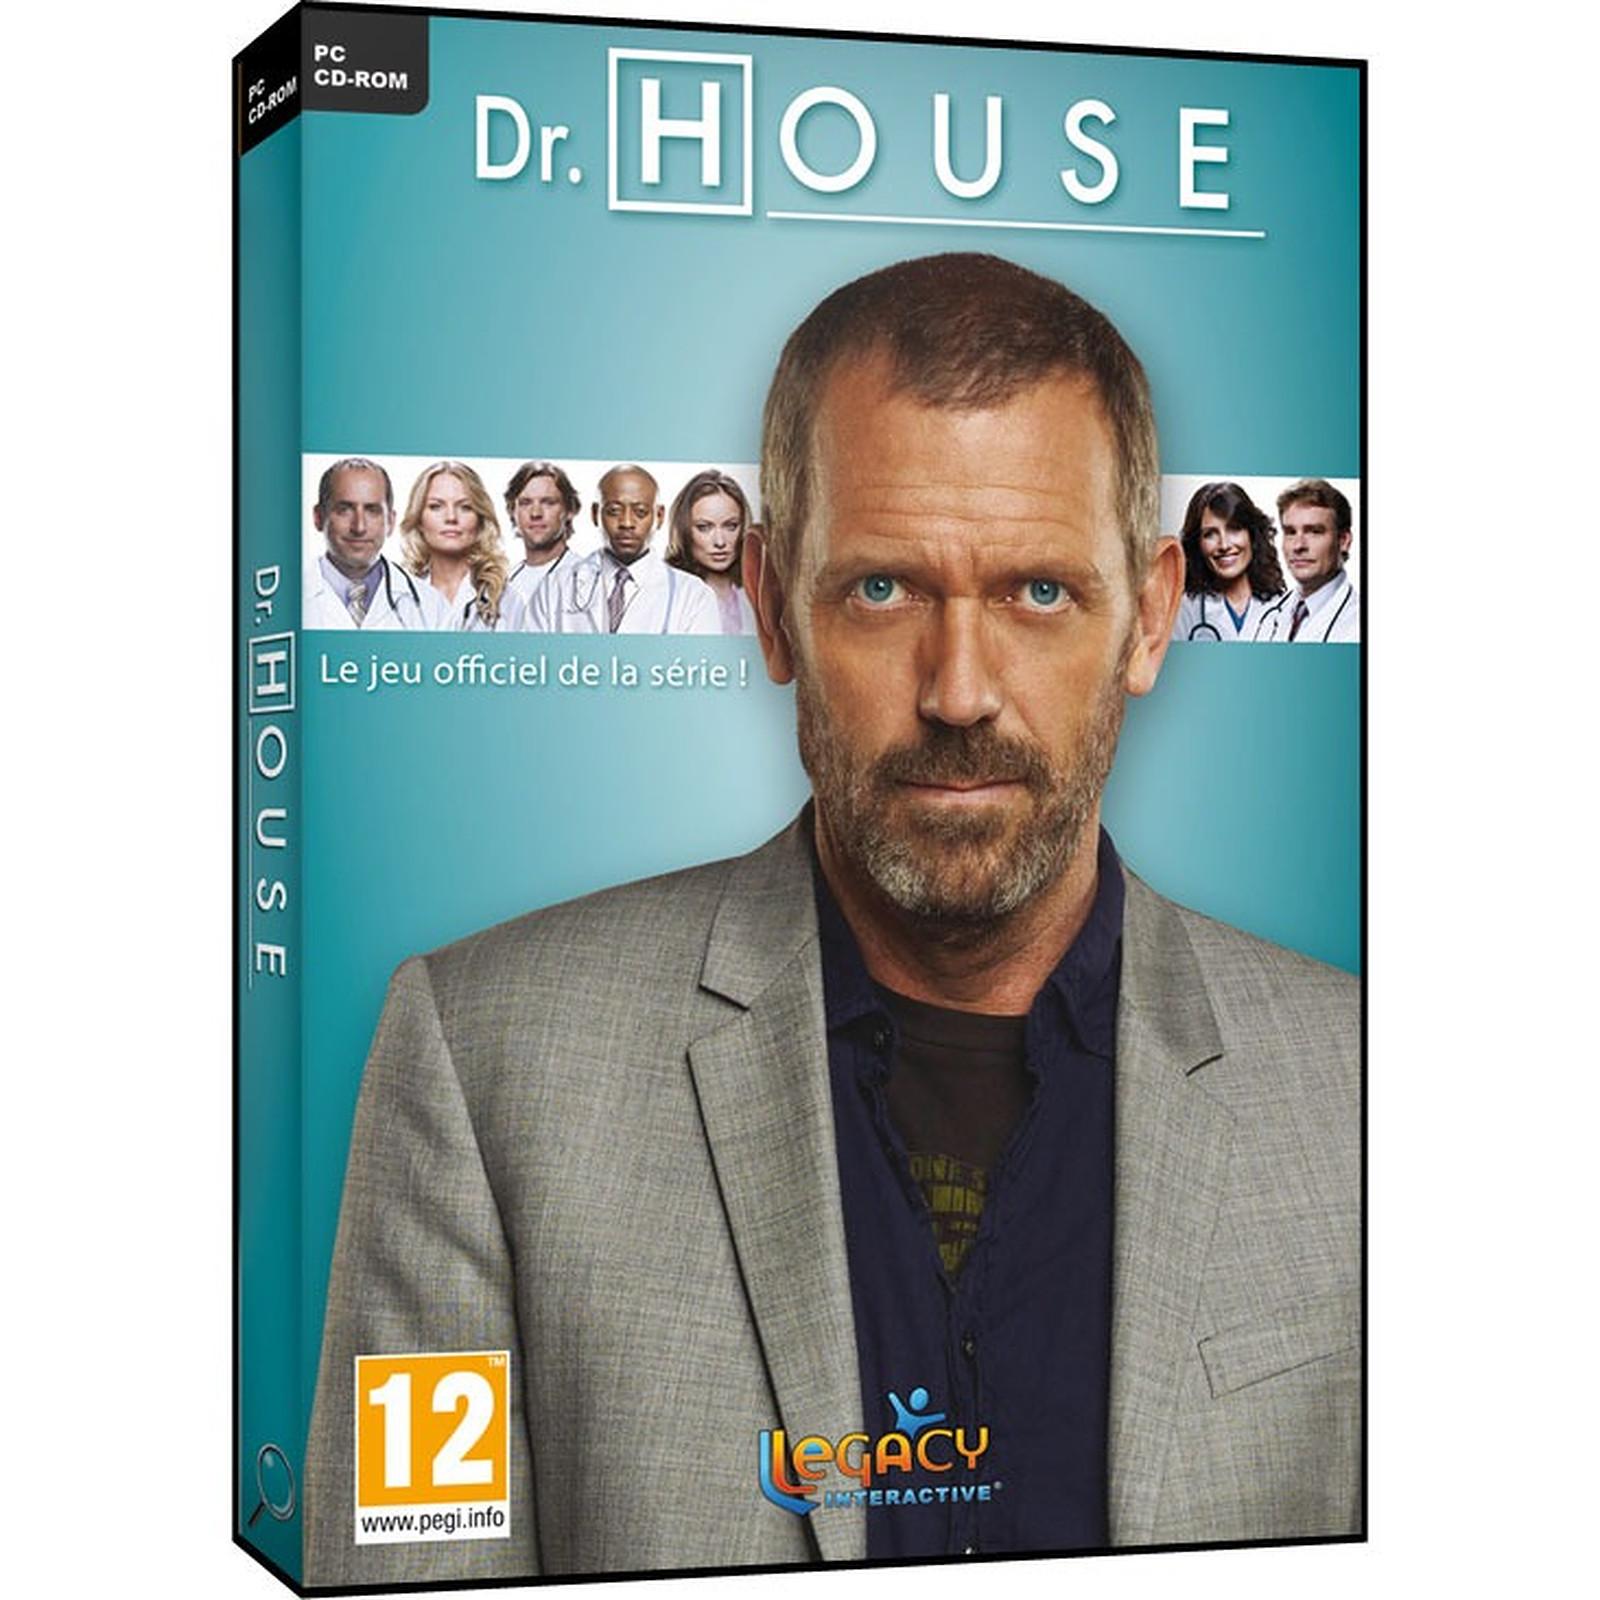 Dr. HOUSE (PC)